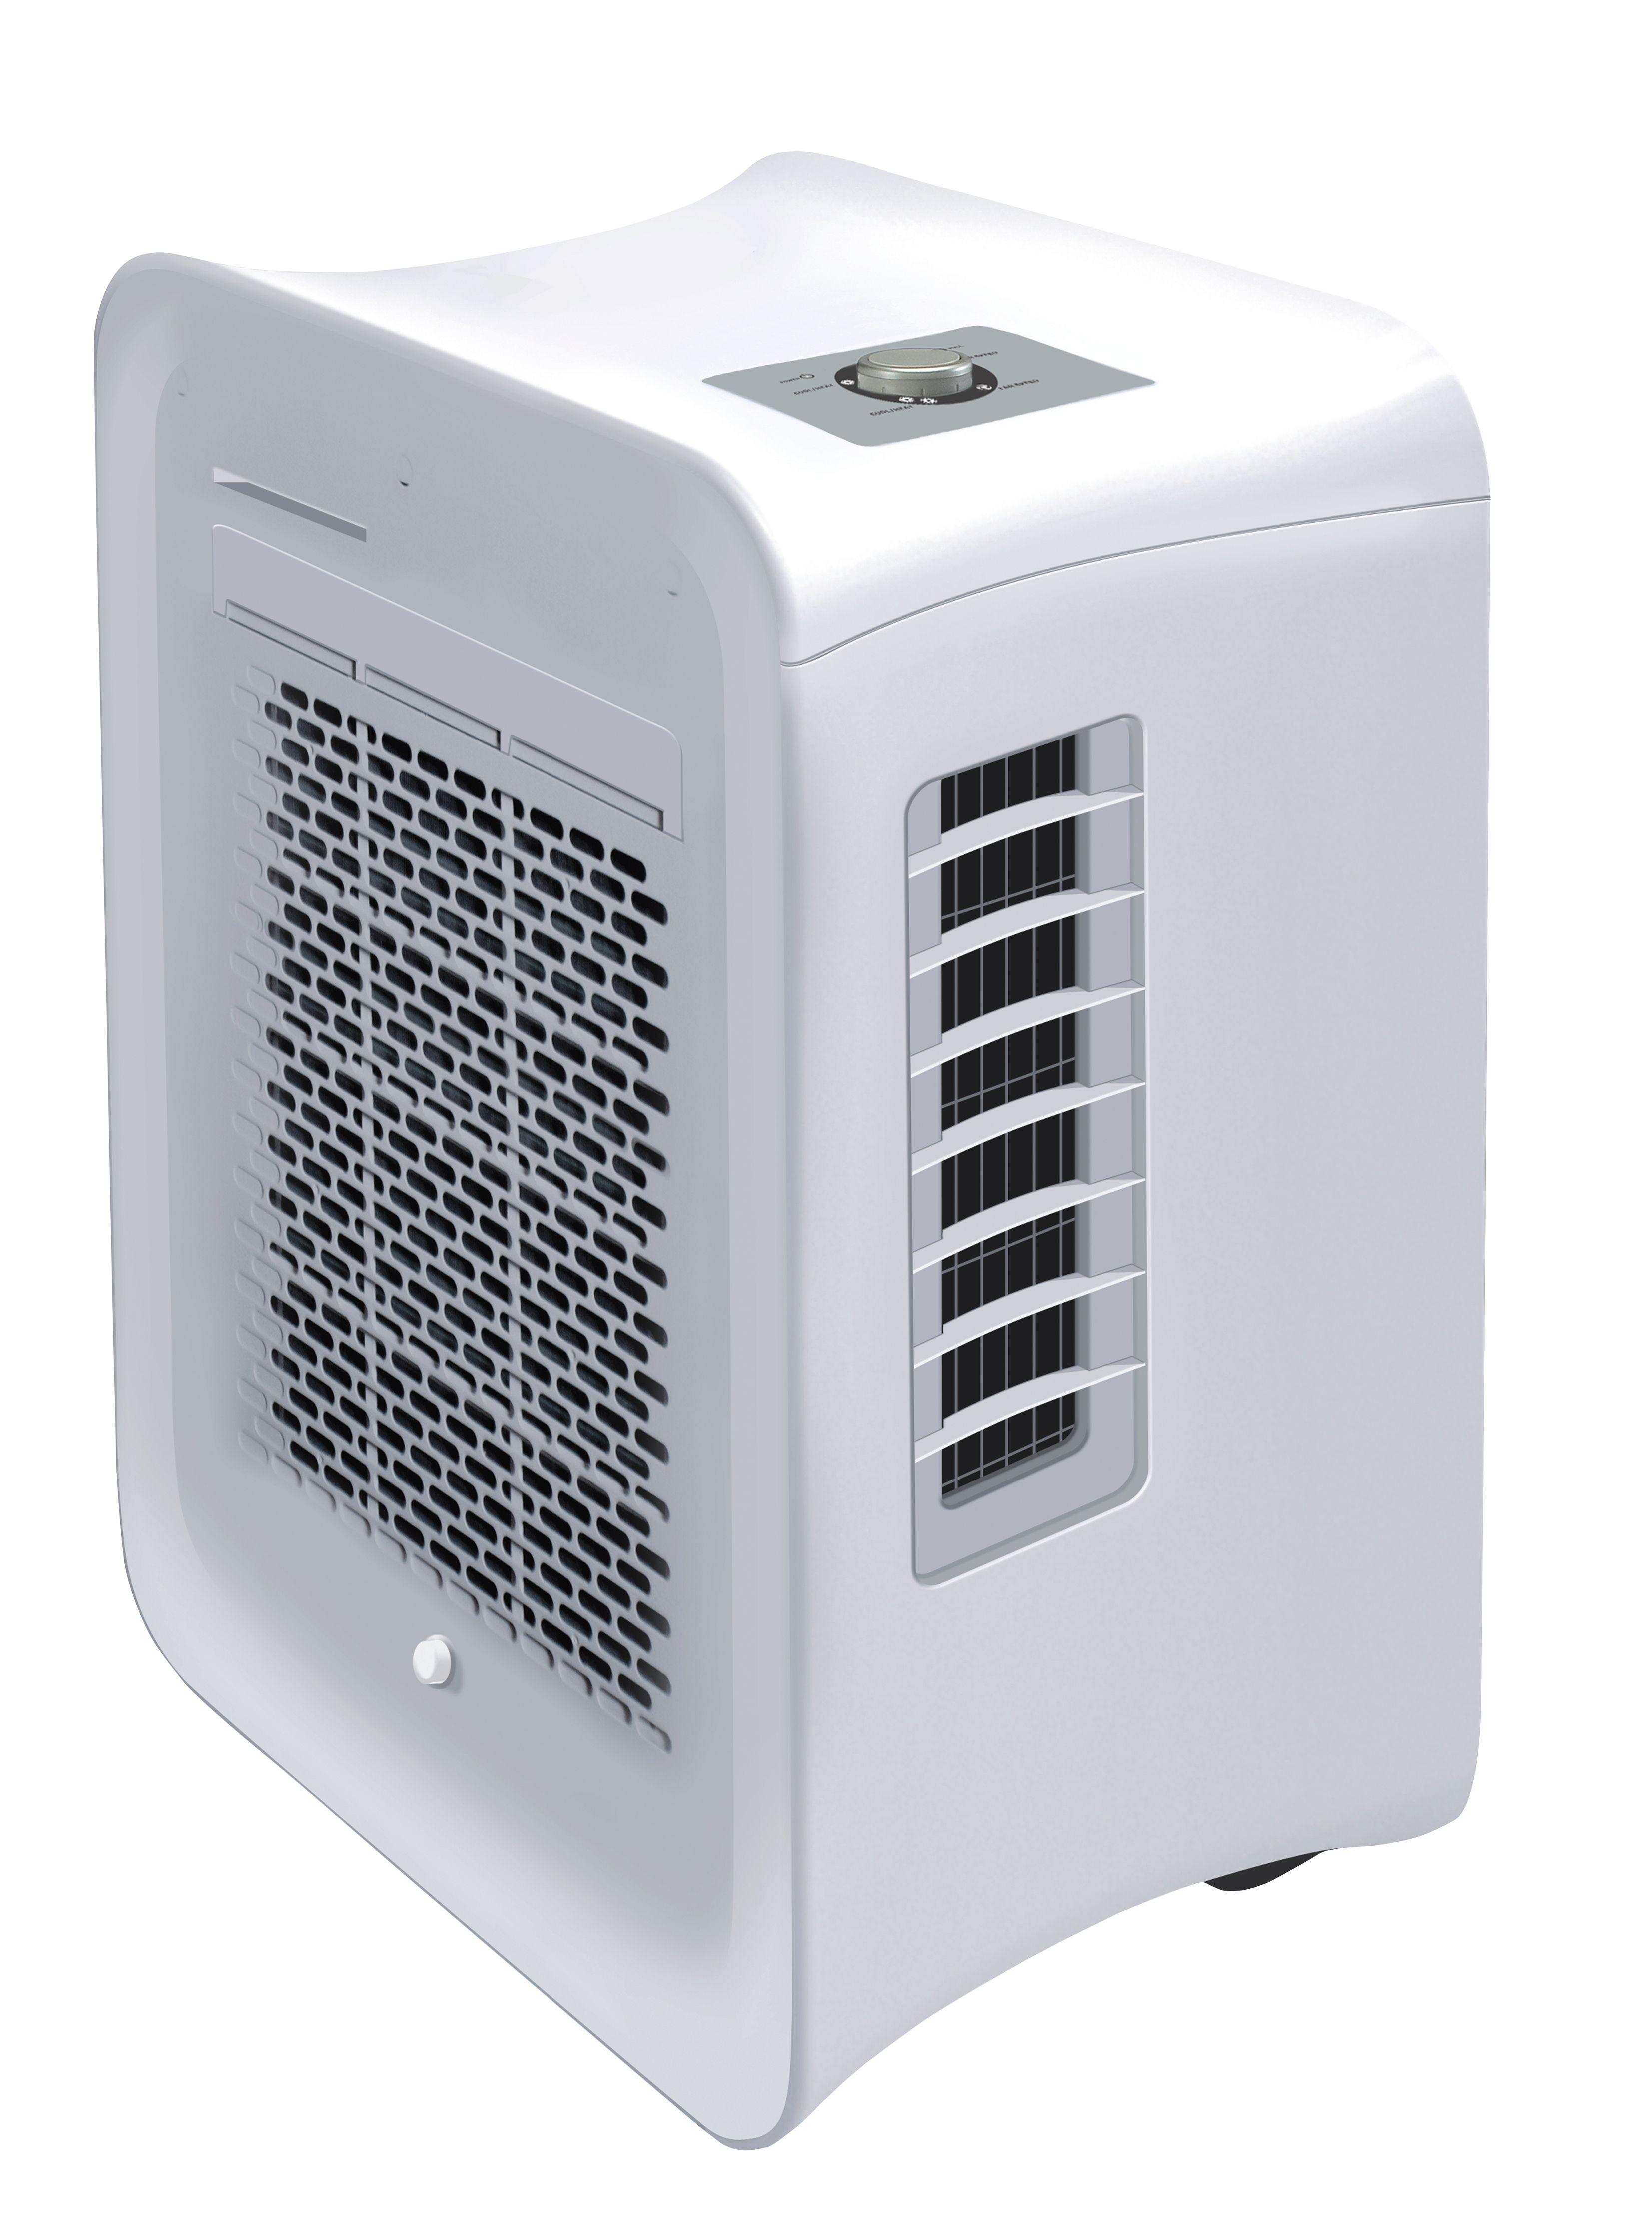 The Dimplex 2.6kW Portable Air Conditioner model EWTC9